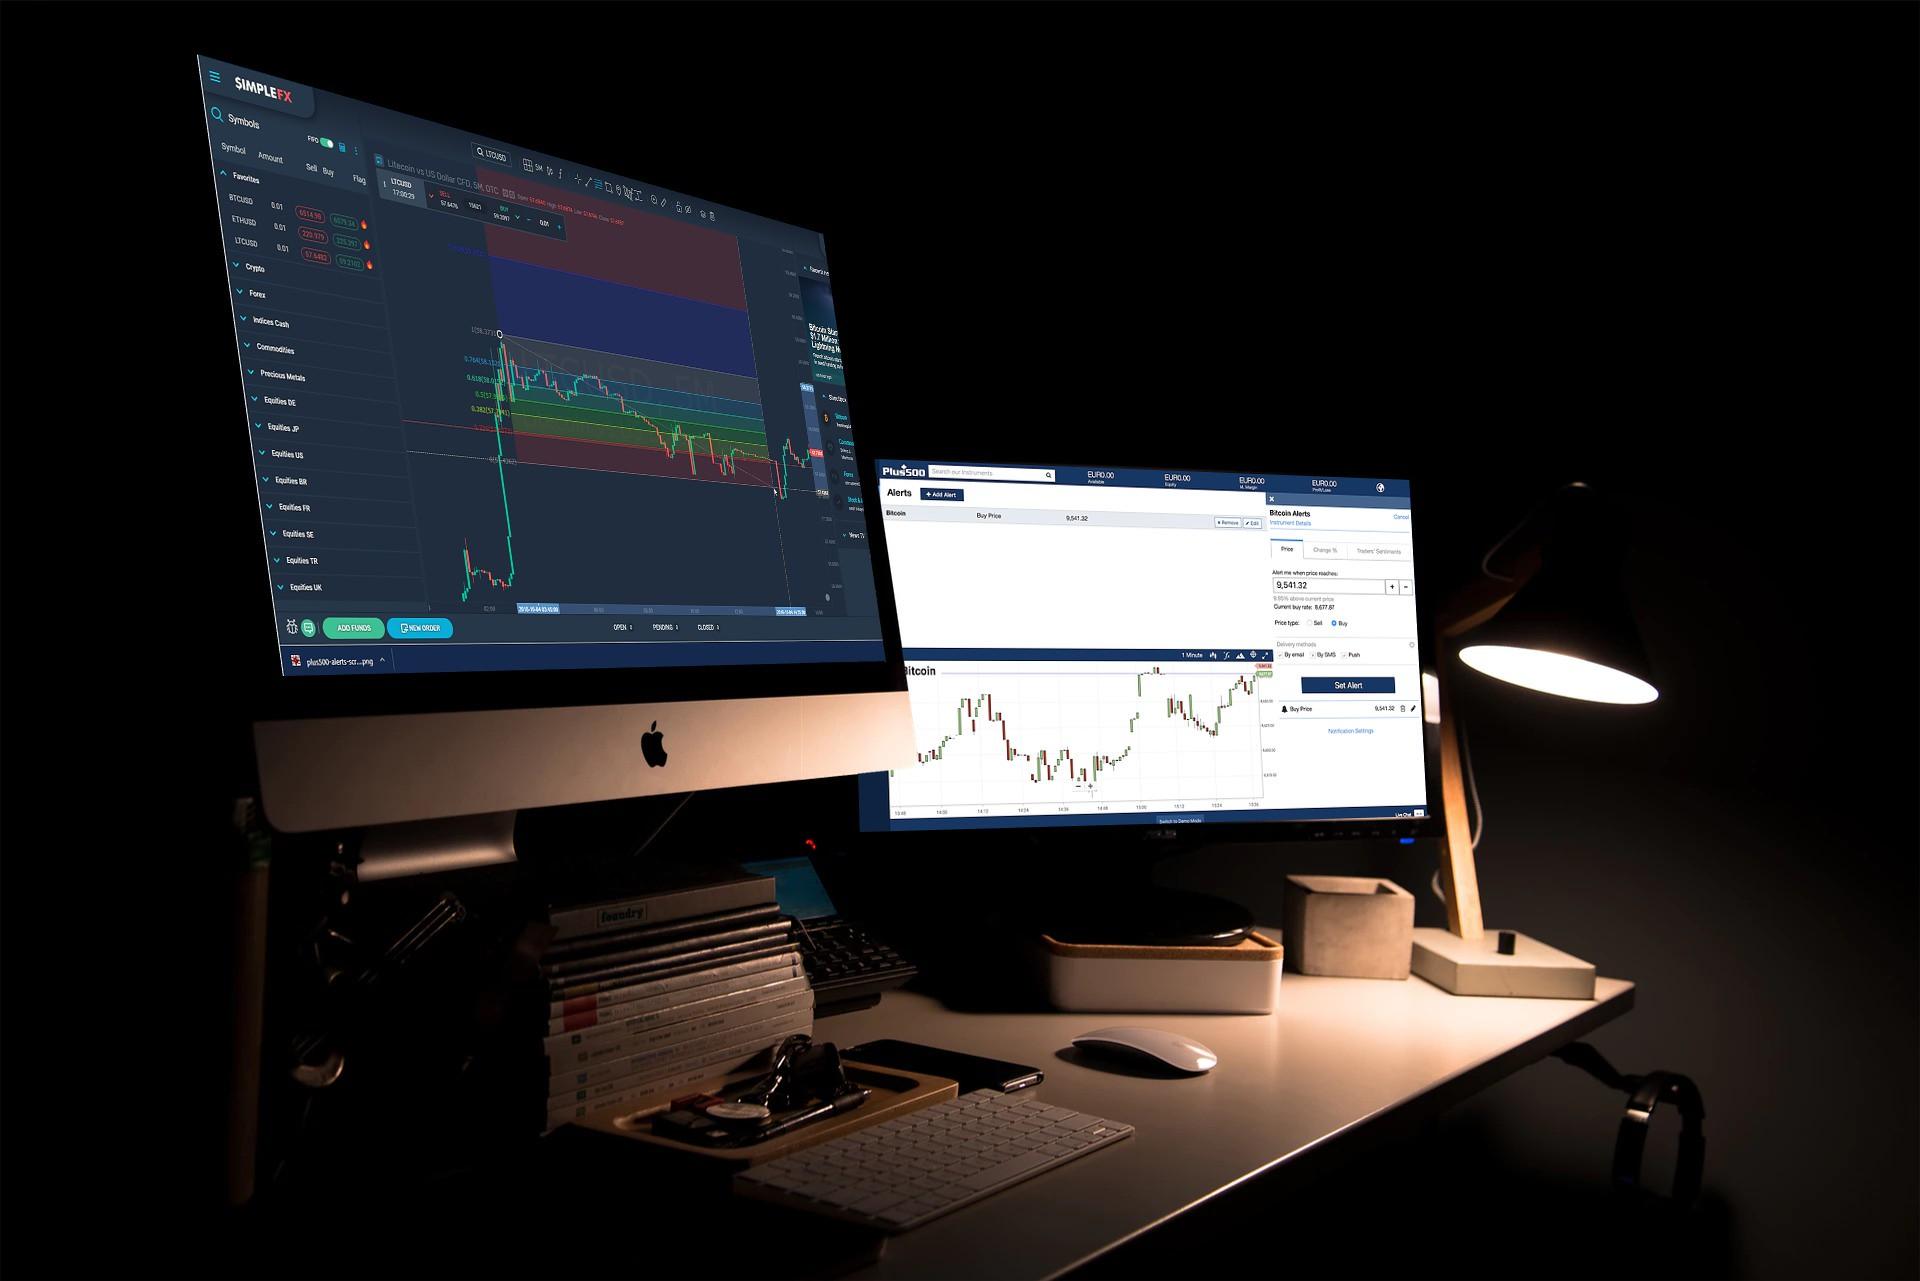 Фото: аккаунта Simple FX с сайта flickr.com